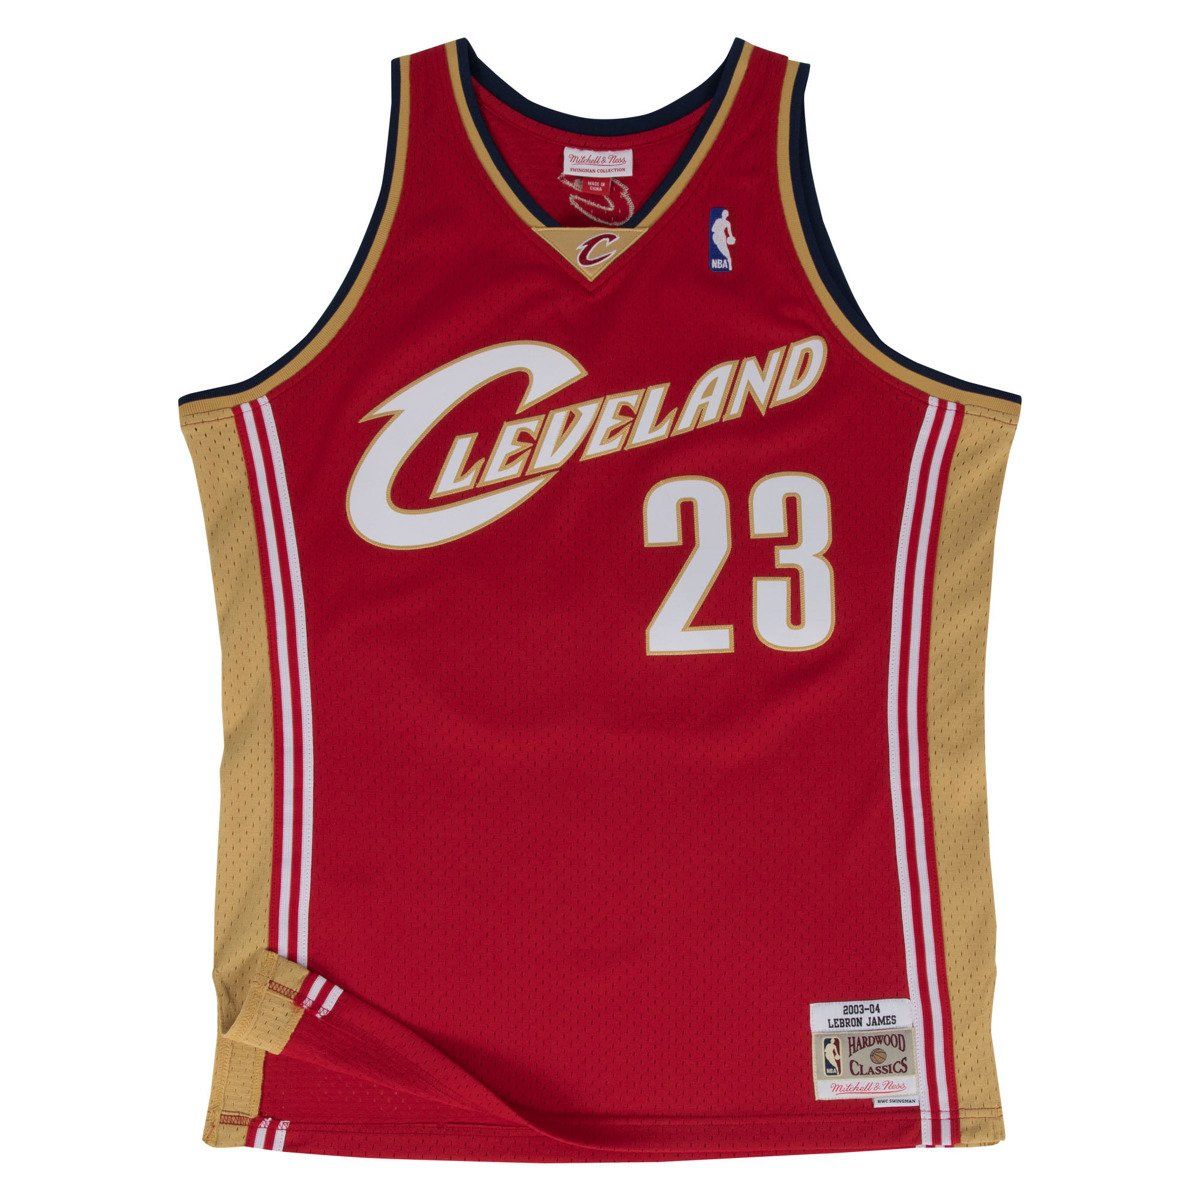 promo code 06792 2382f Mitchell & Ness LeBron James 2003-04 NBA Swingman Cleveland Cavaliers Jersey